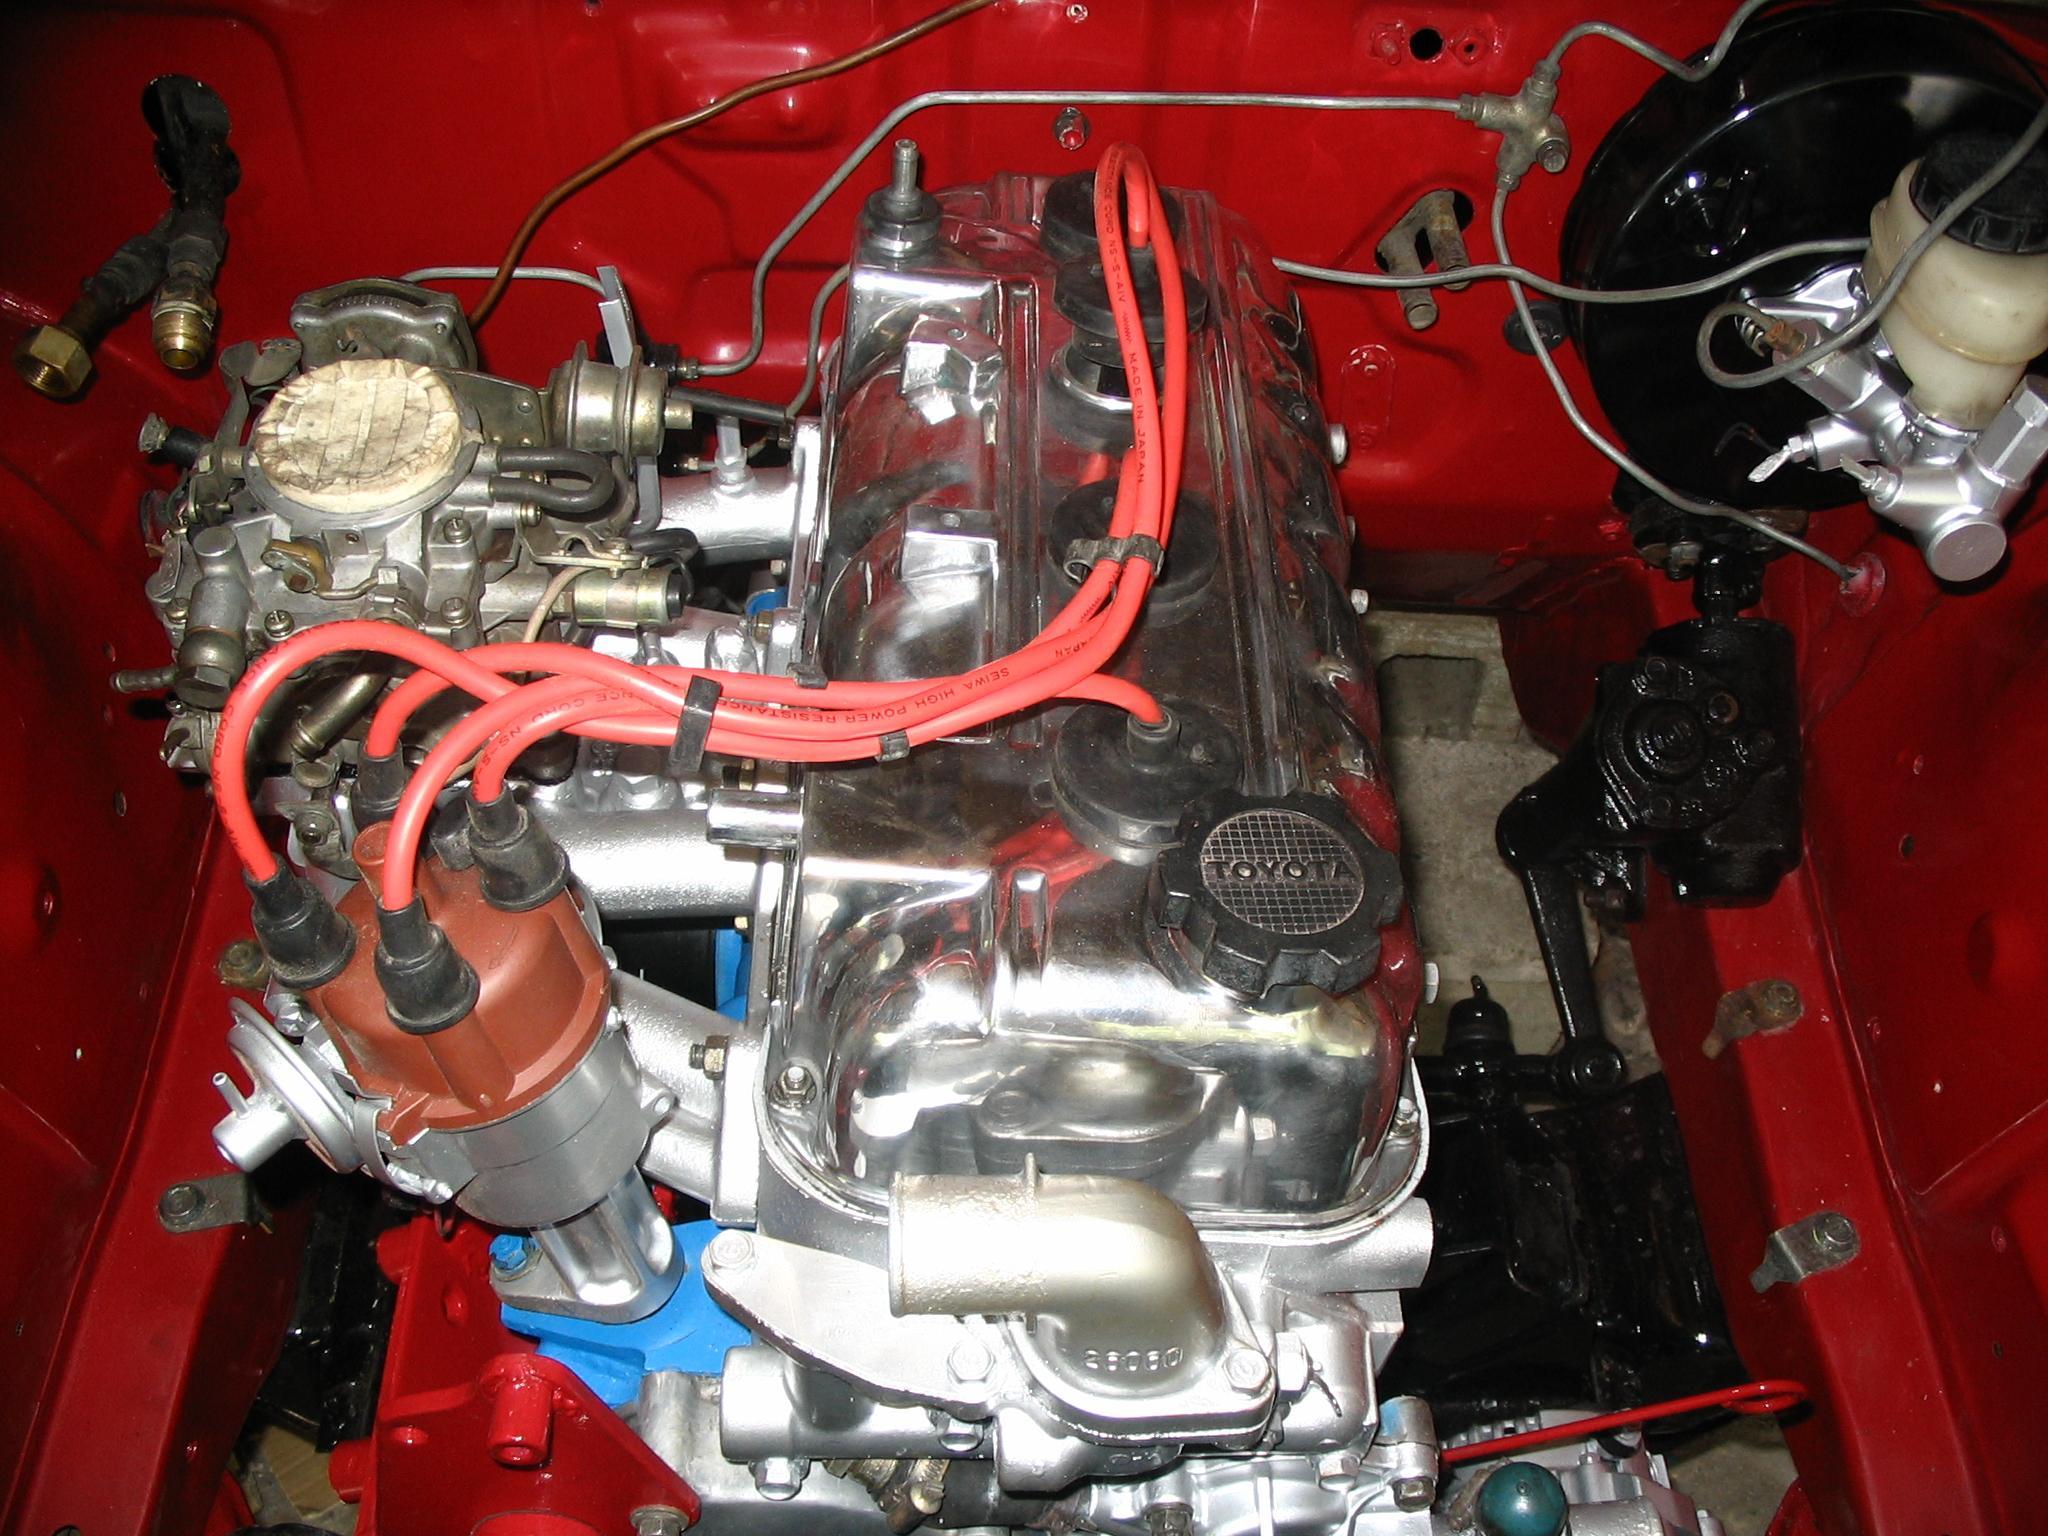 3tc Engine Modification - Engine Conversions - rollaclub com